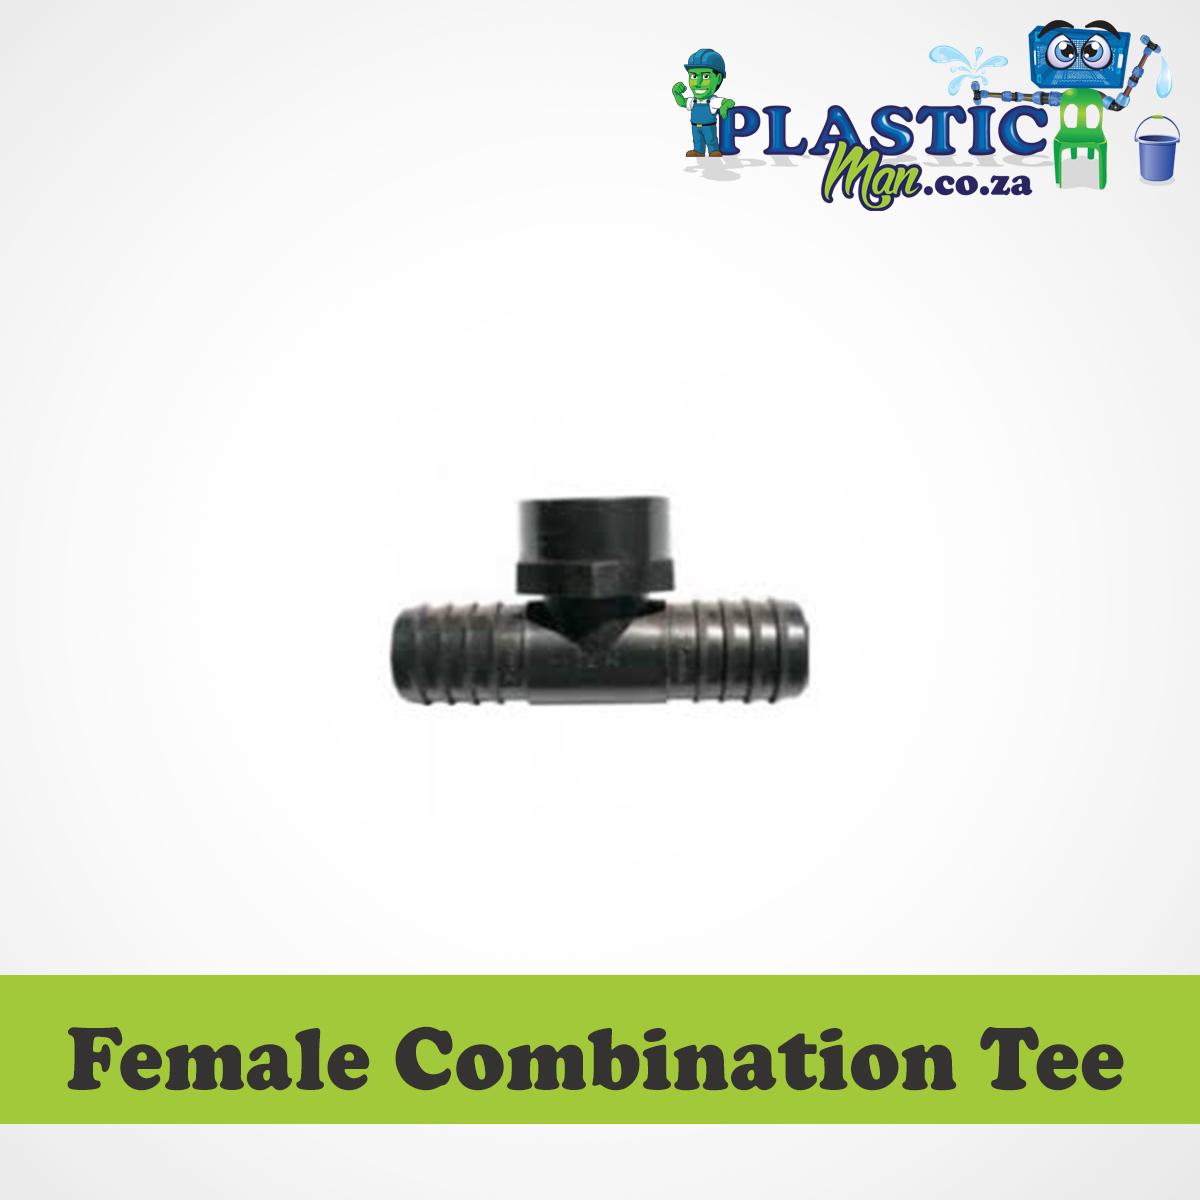 Plasticman LDPE - Female Combination Tee